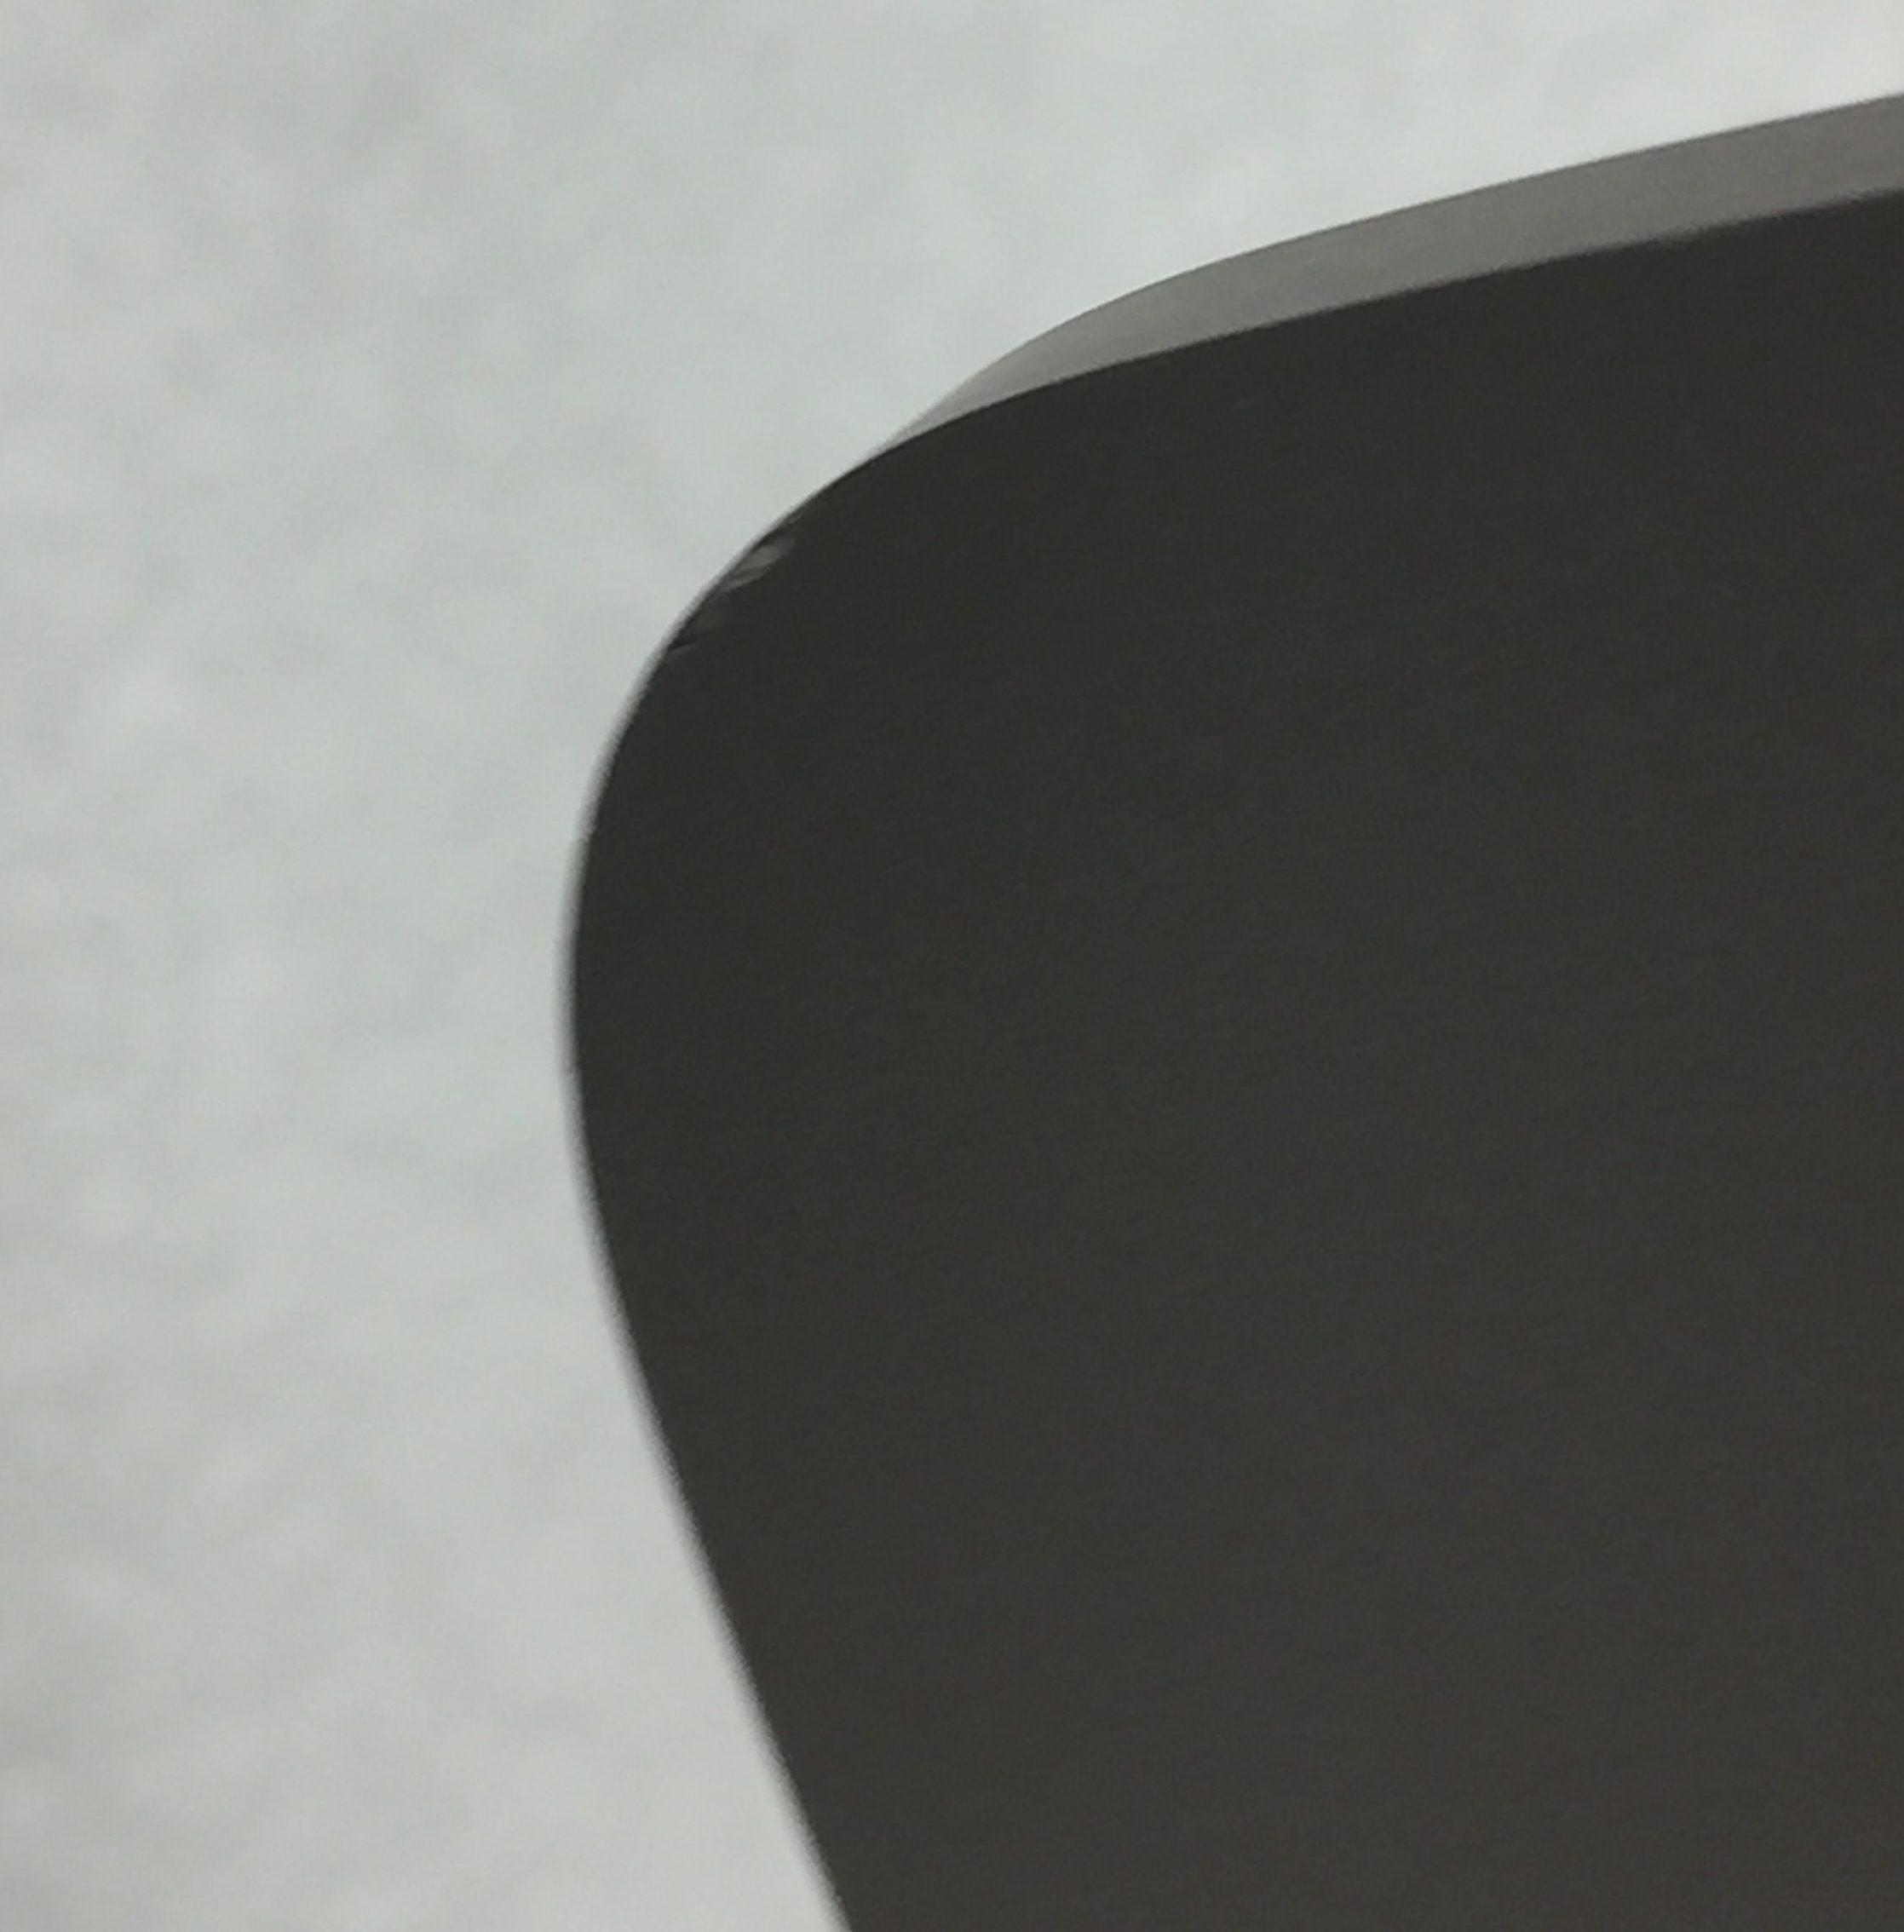 iMac 21.5-inch, Intel QuadCore i5 2,9 GHz, 8 GB, 1 TB en HDD, imagen 5